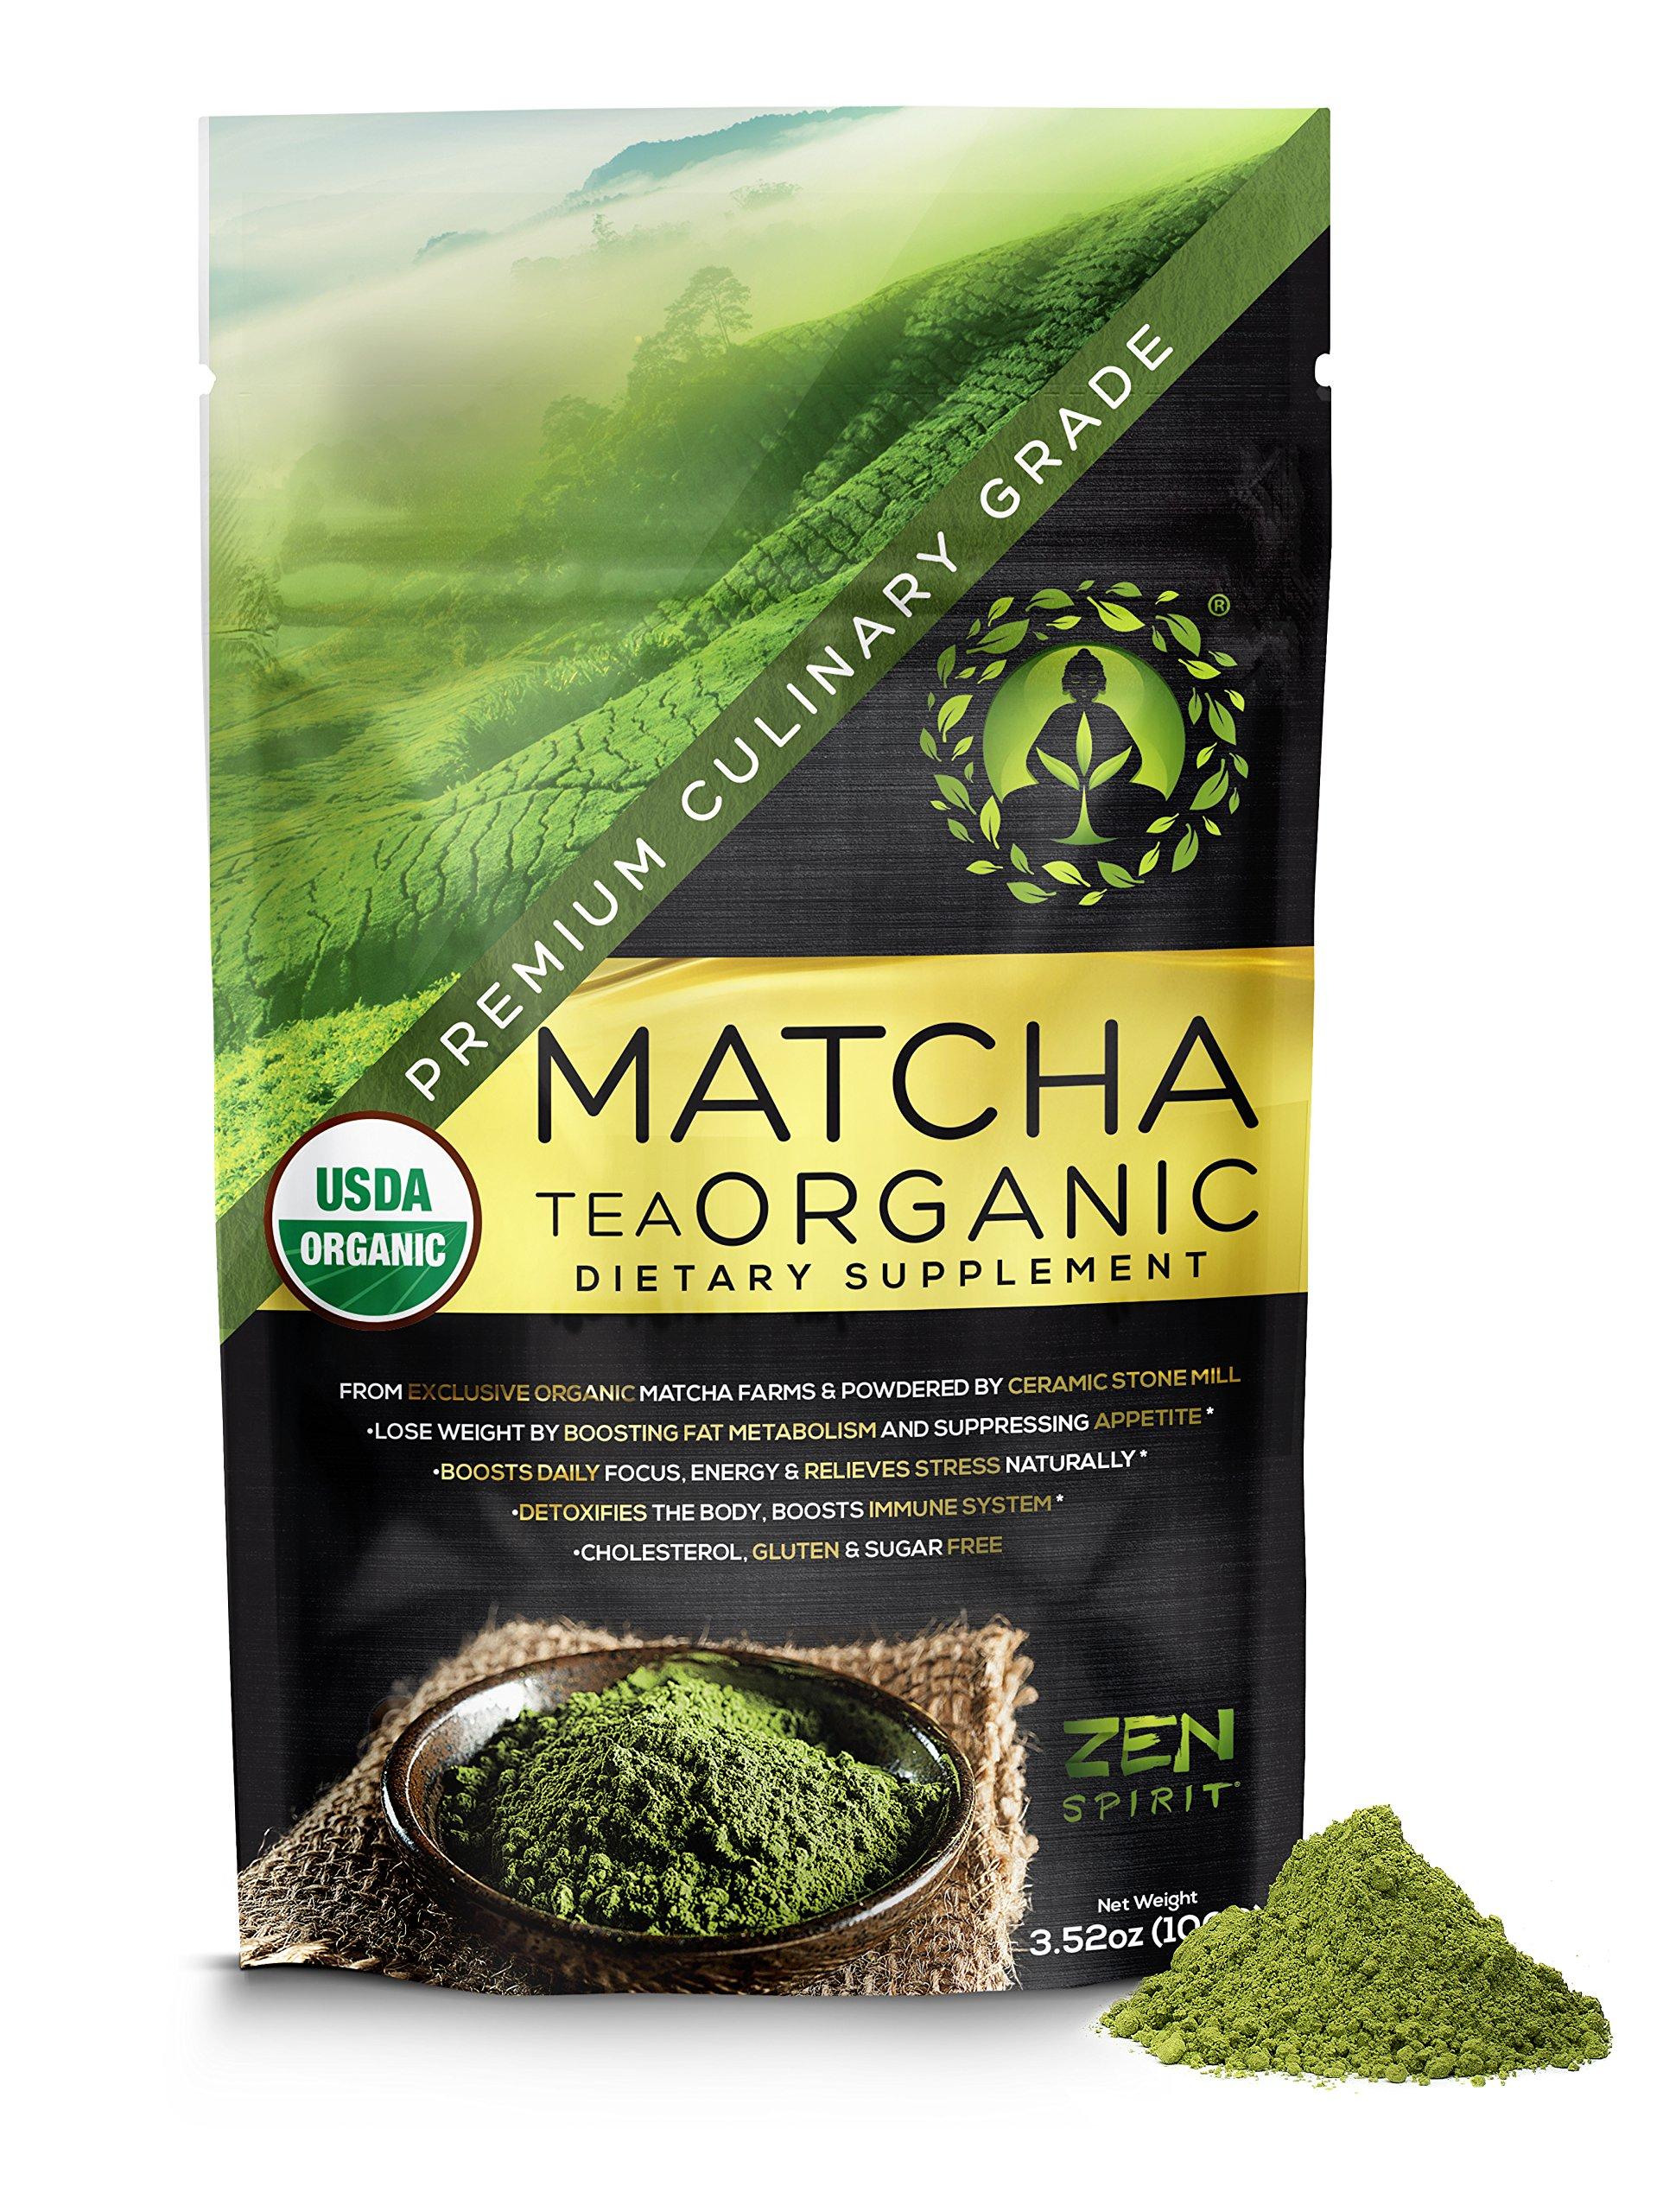 Matcha Green Tea Powder Organic - Japanese Premium Culinary Grade, Unsweetened & Sugar Free - USDA & Vegan Certified - 100g (3.52 oz) - Perfect for Baking, Smoothies, Latte, Iced tea & Weight Loss by Zen Spirit